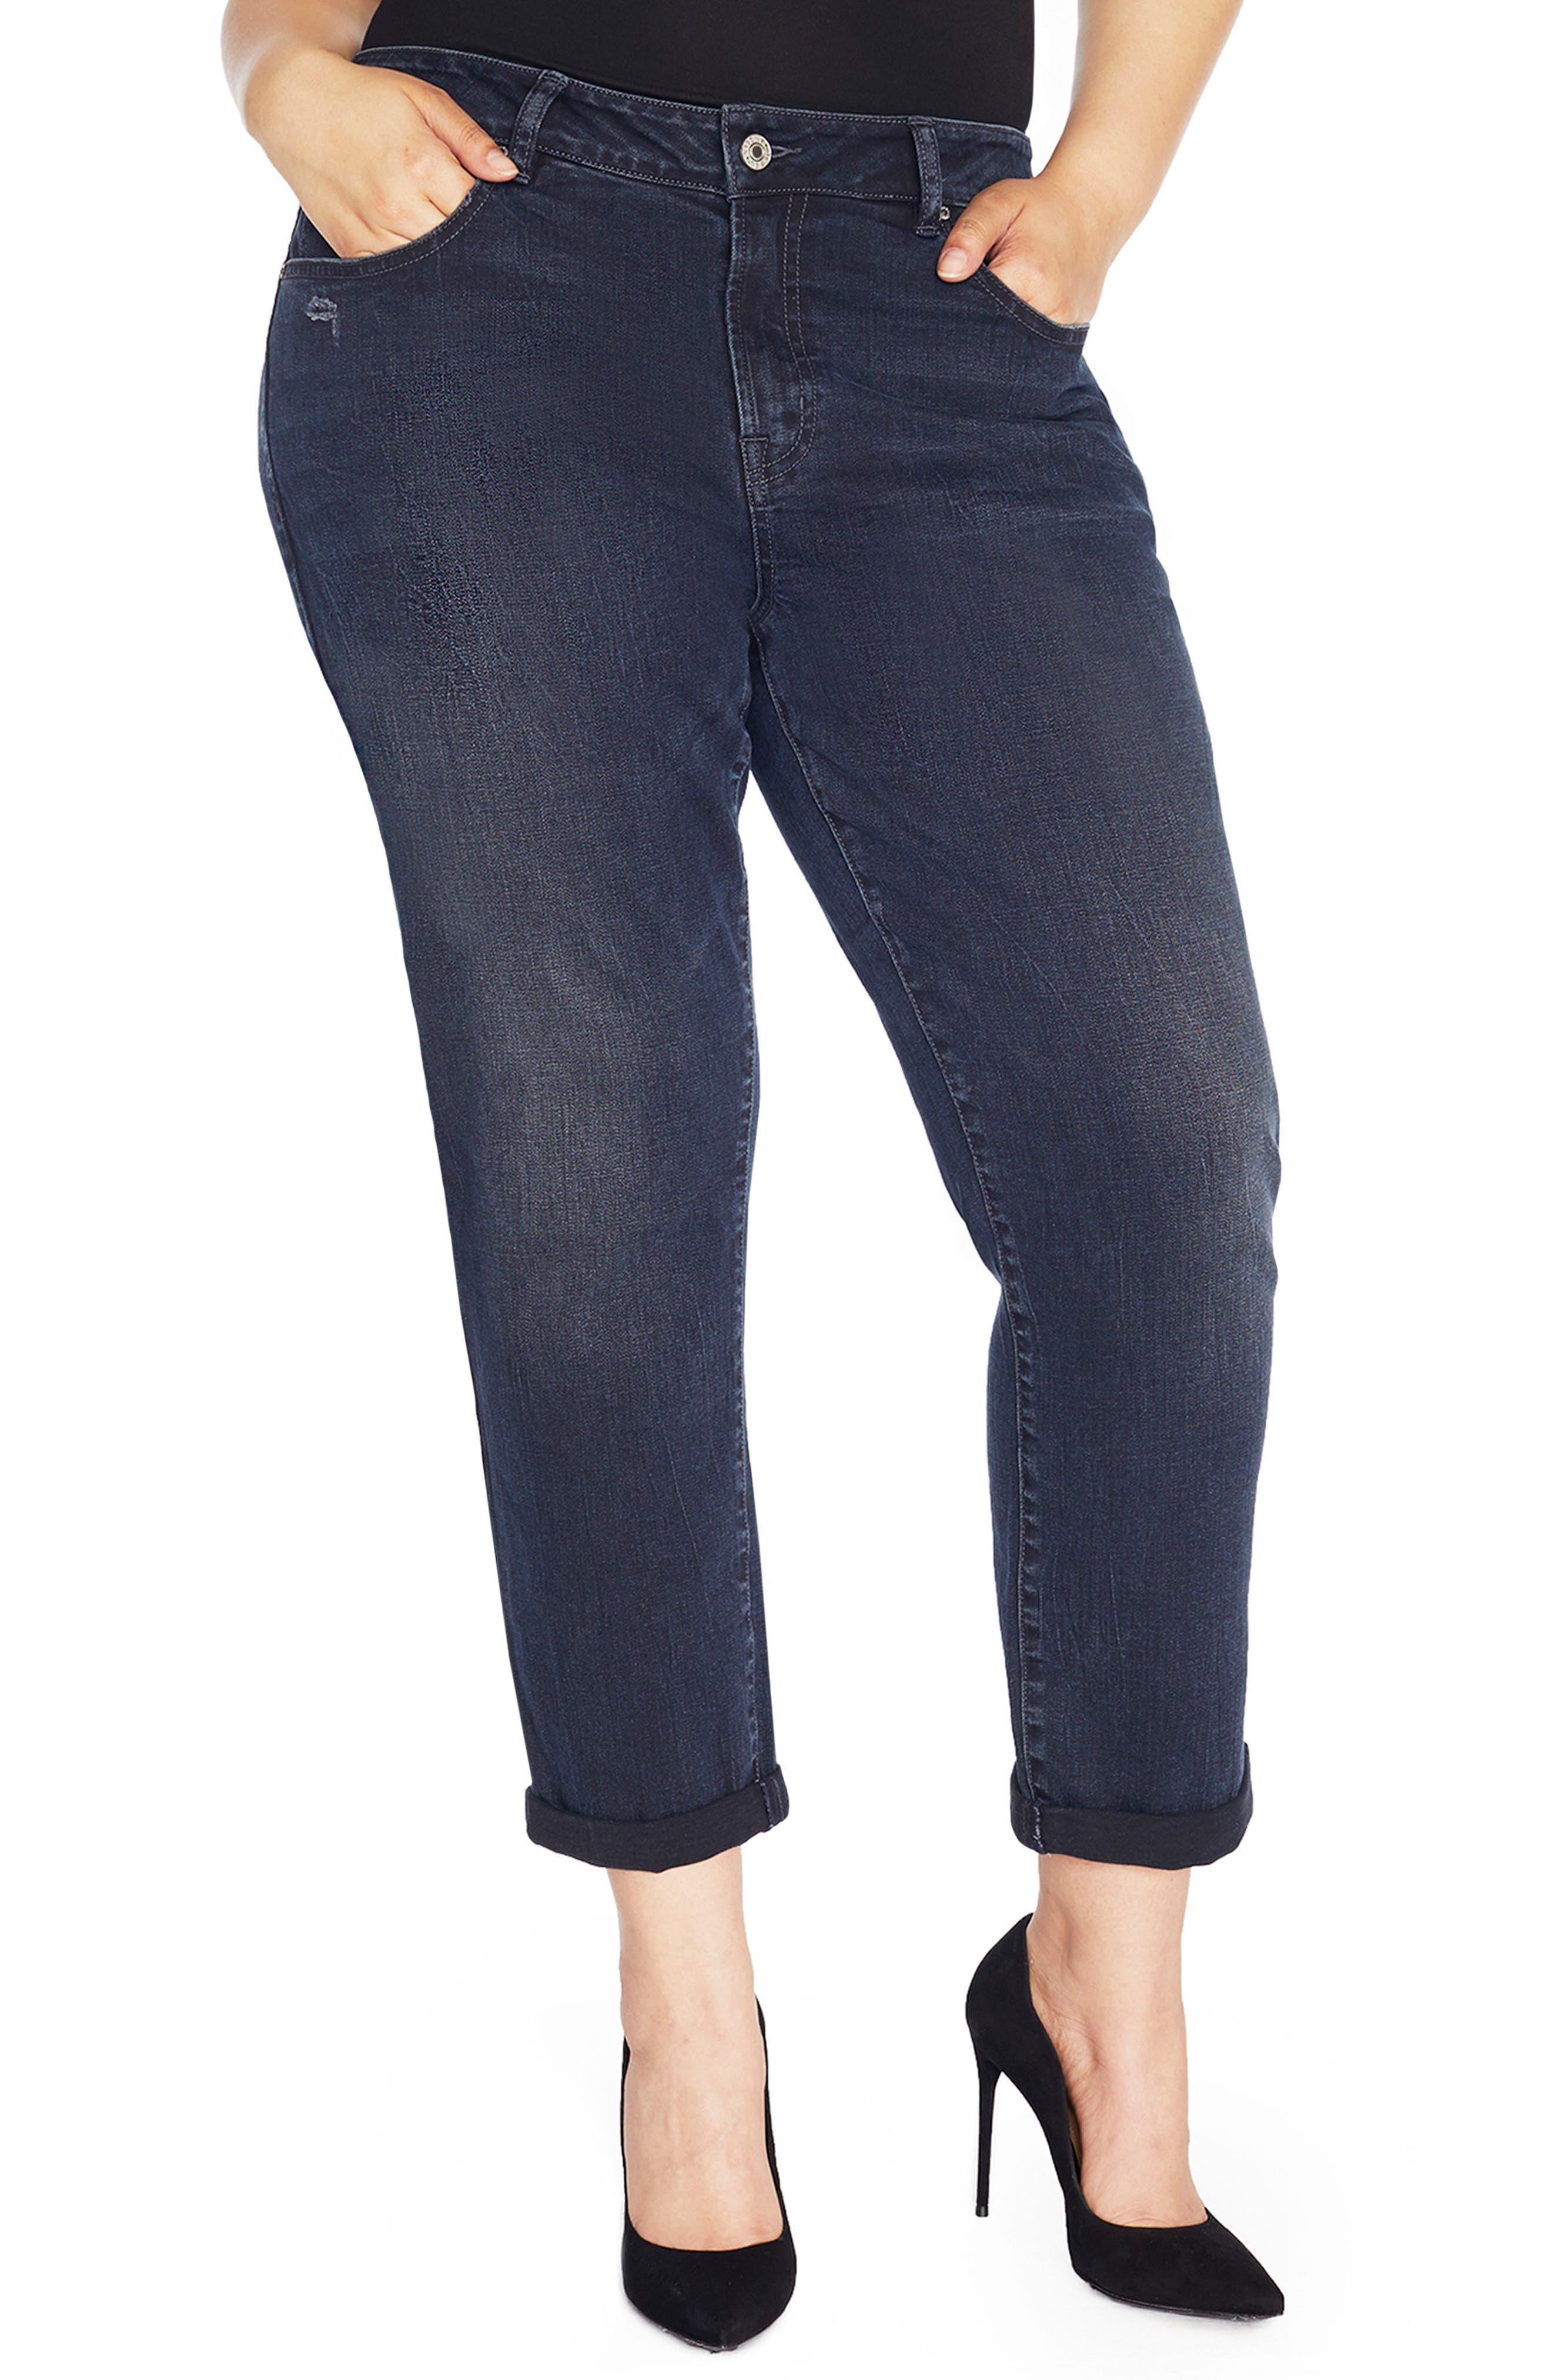 REBEL WILSON X ANGELS The Ryot Slim Boyfriend Jeans (Plus Size)